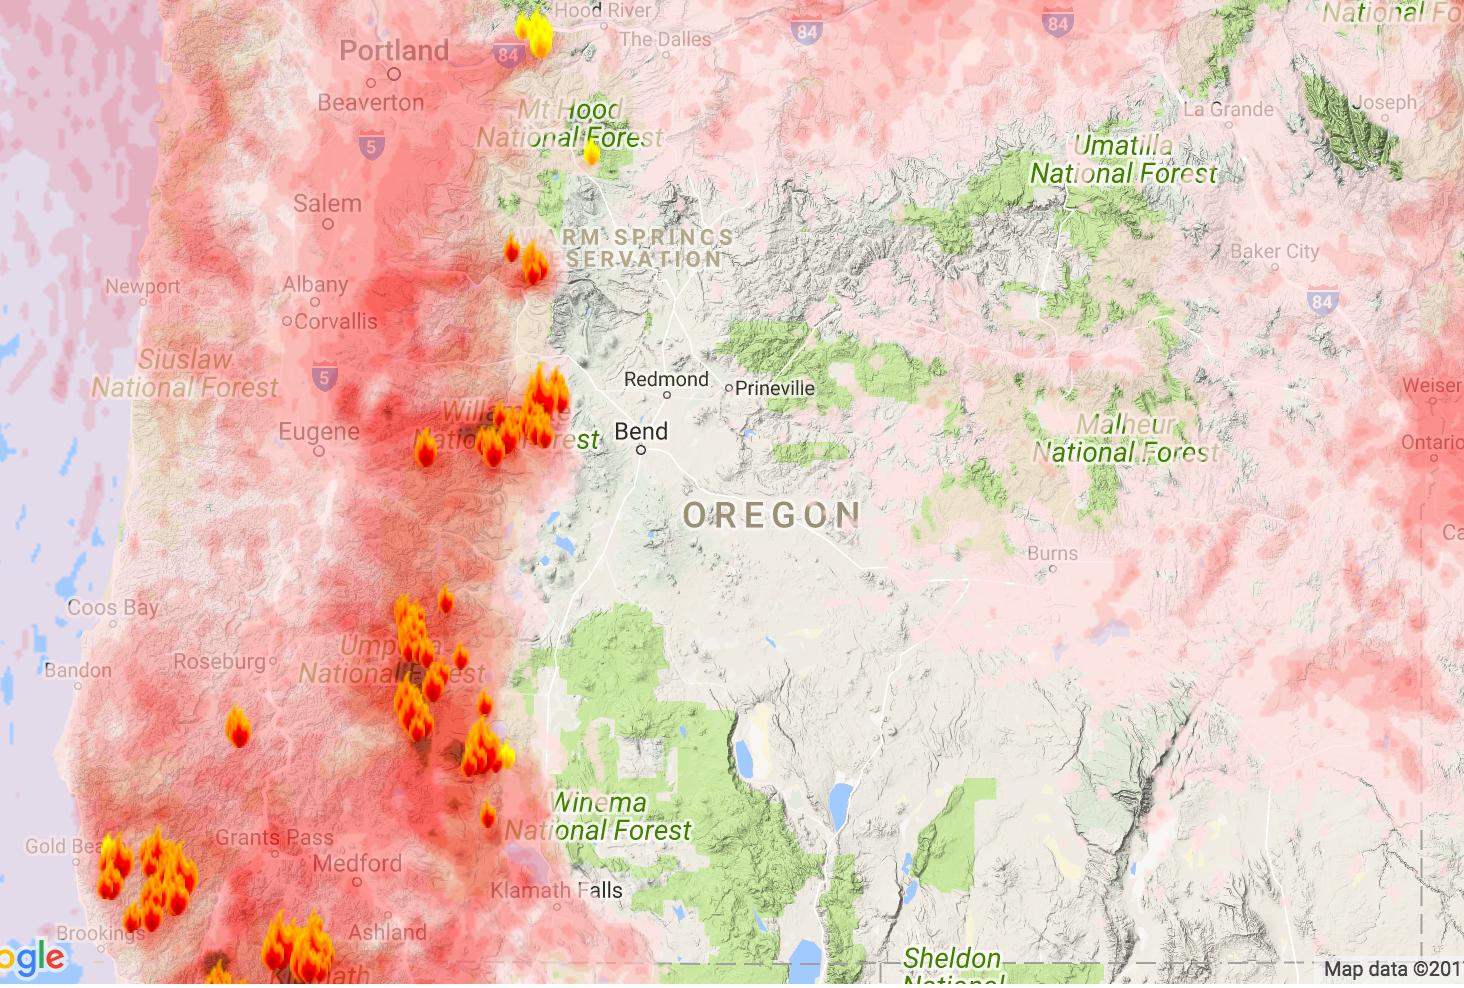 Oregon Smoke Information Oregon State Smoke Forecast for Monday